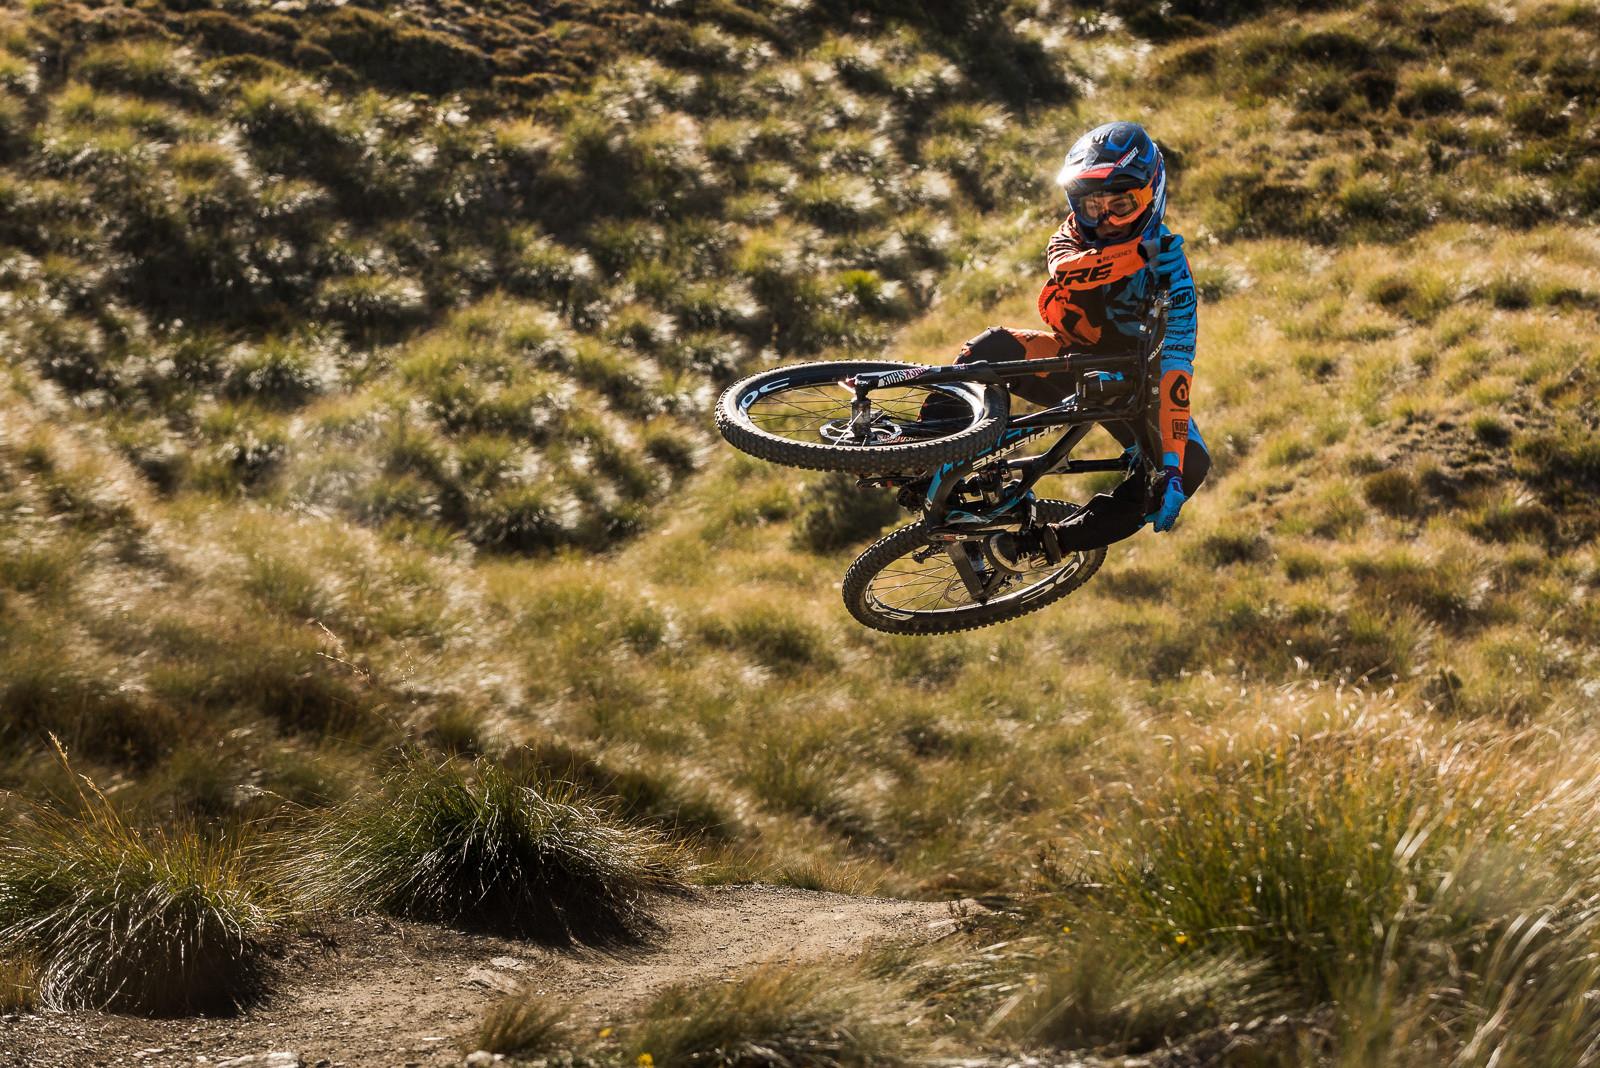 Finn Again - Lapierre Gravity Republic in New Zealand - Mountain Biking Pictures - Vital MTB